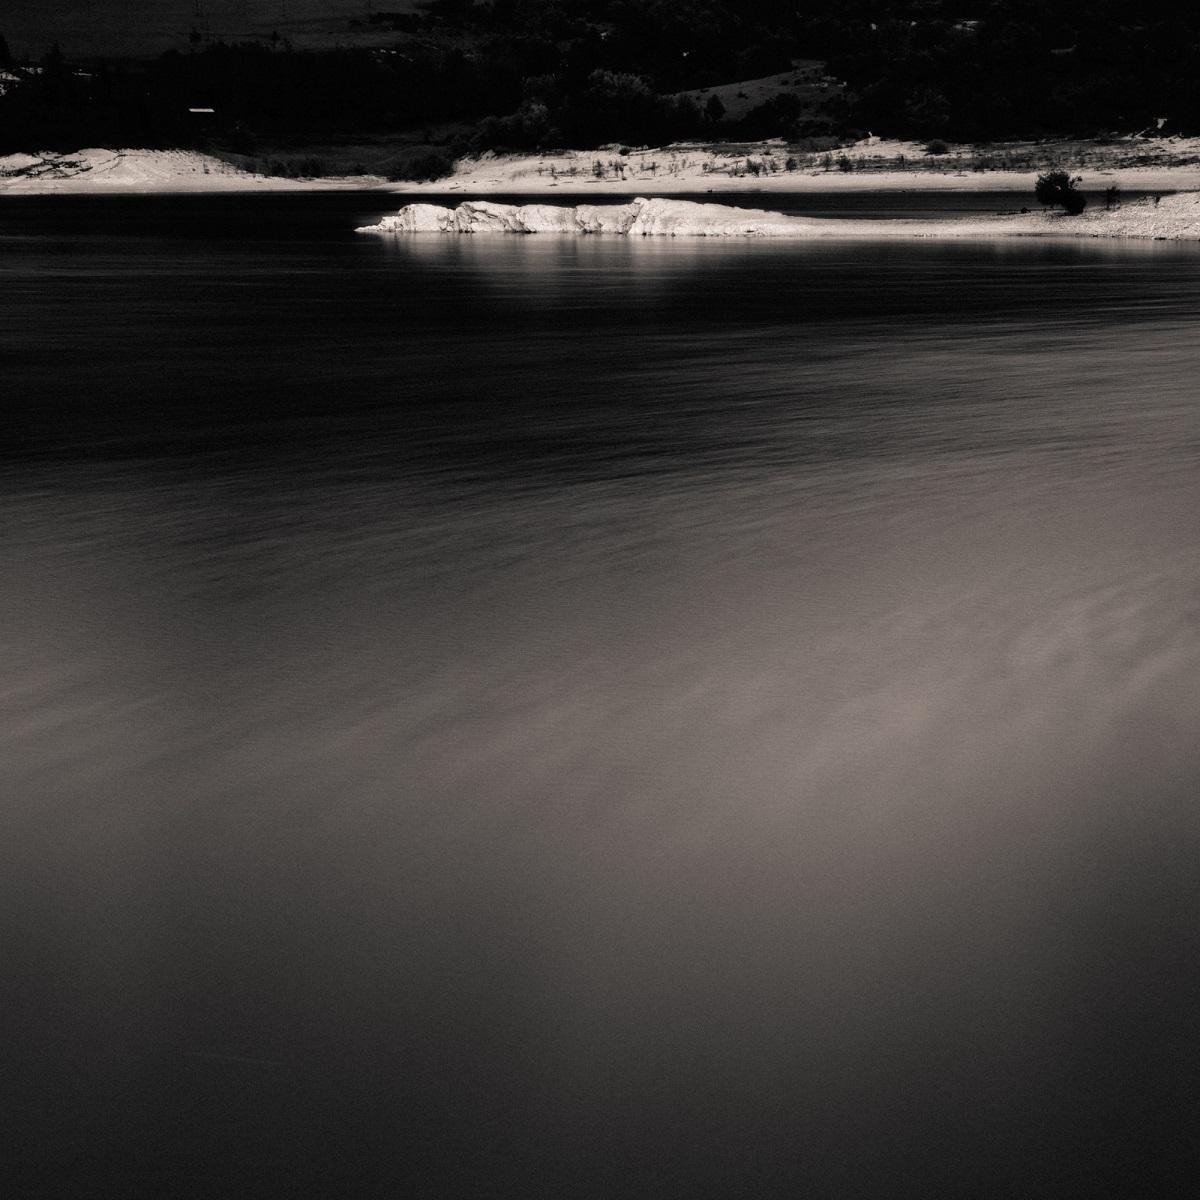 My Personal Best: Italian Photographer Pierpaolo Francesconi